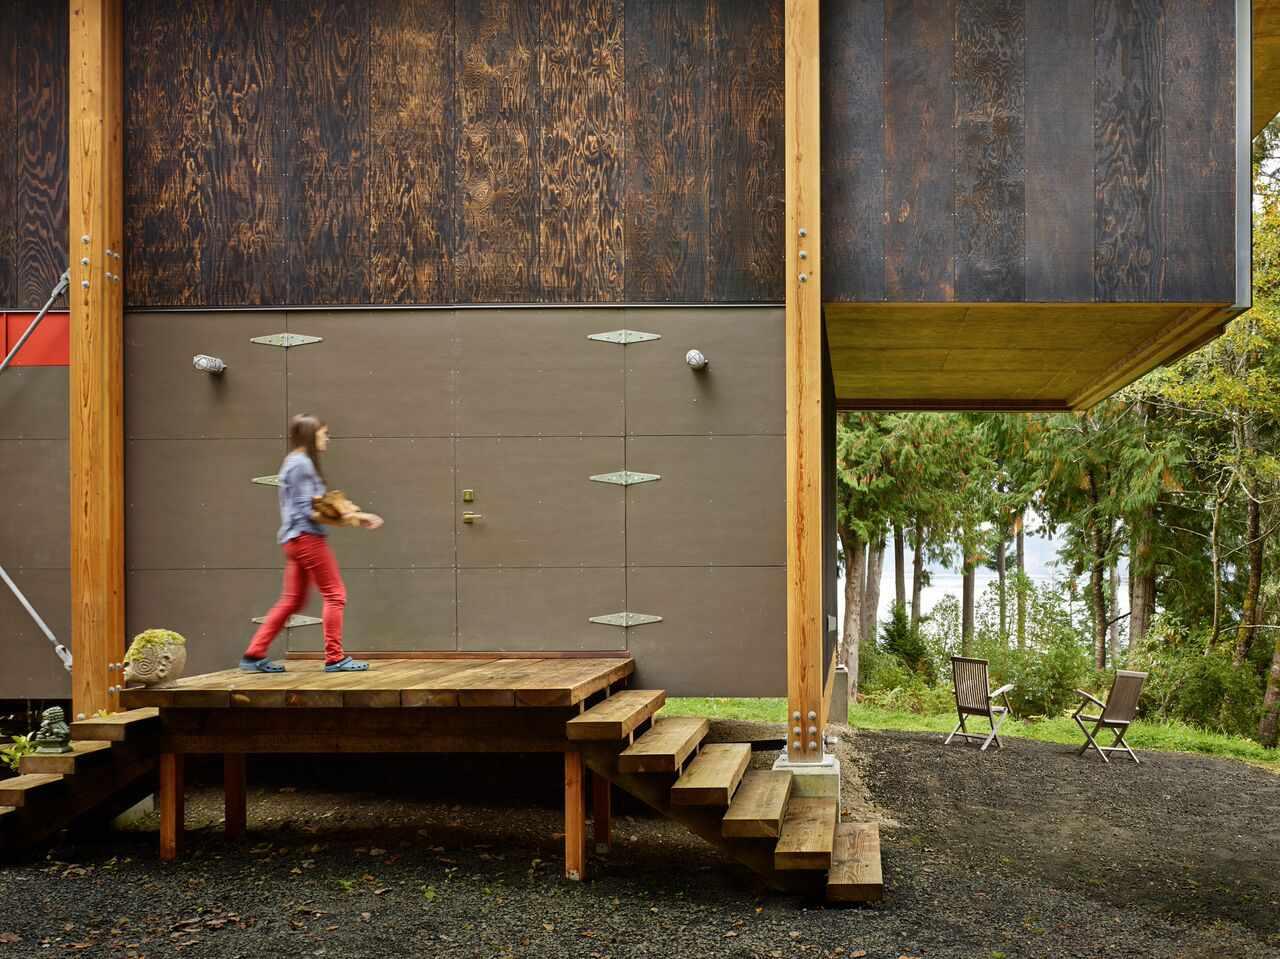 Exterior of Scavenger Studio by Eerkes Architects, Grapeview, Washington